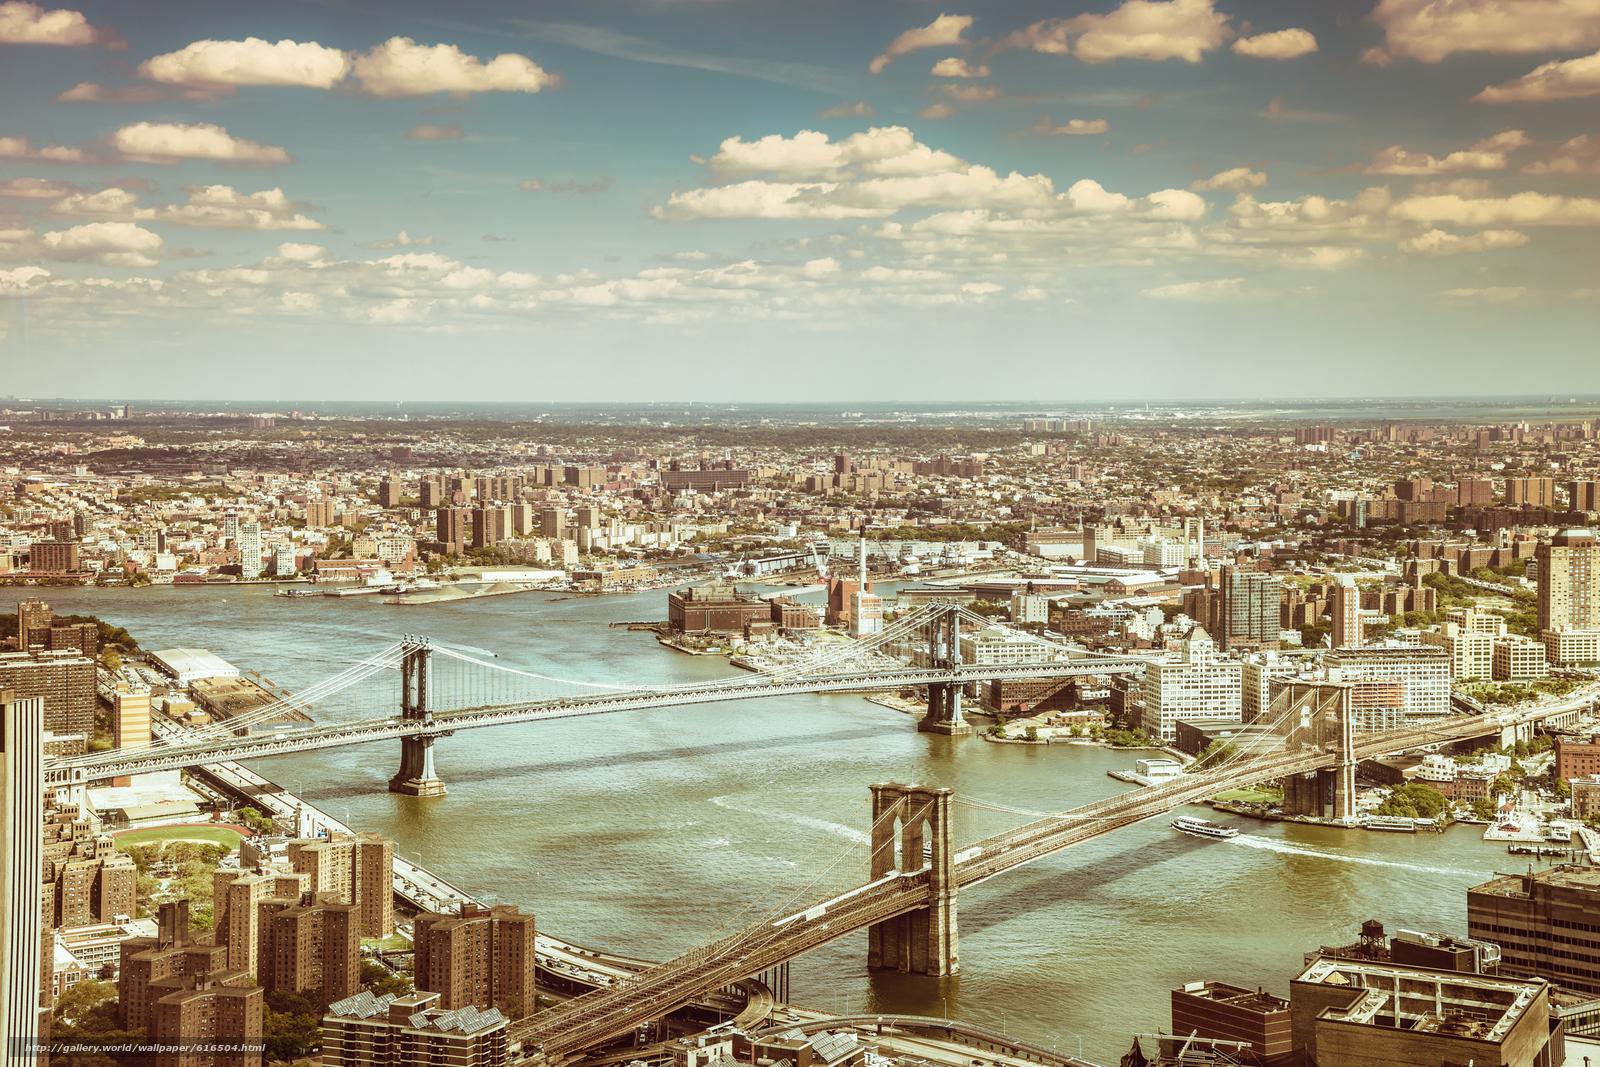 Tlcharger fond d ecran new york city brooklyn bridge manhattan